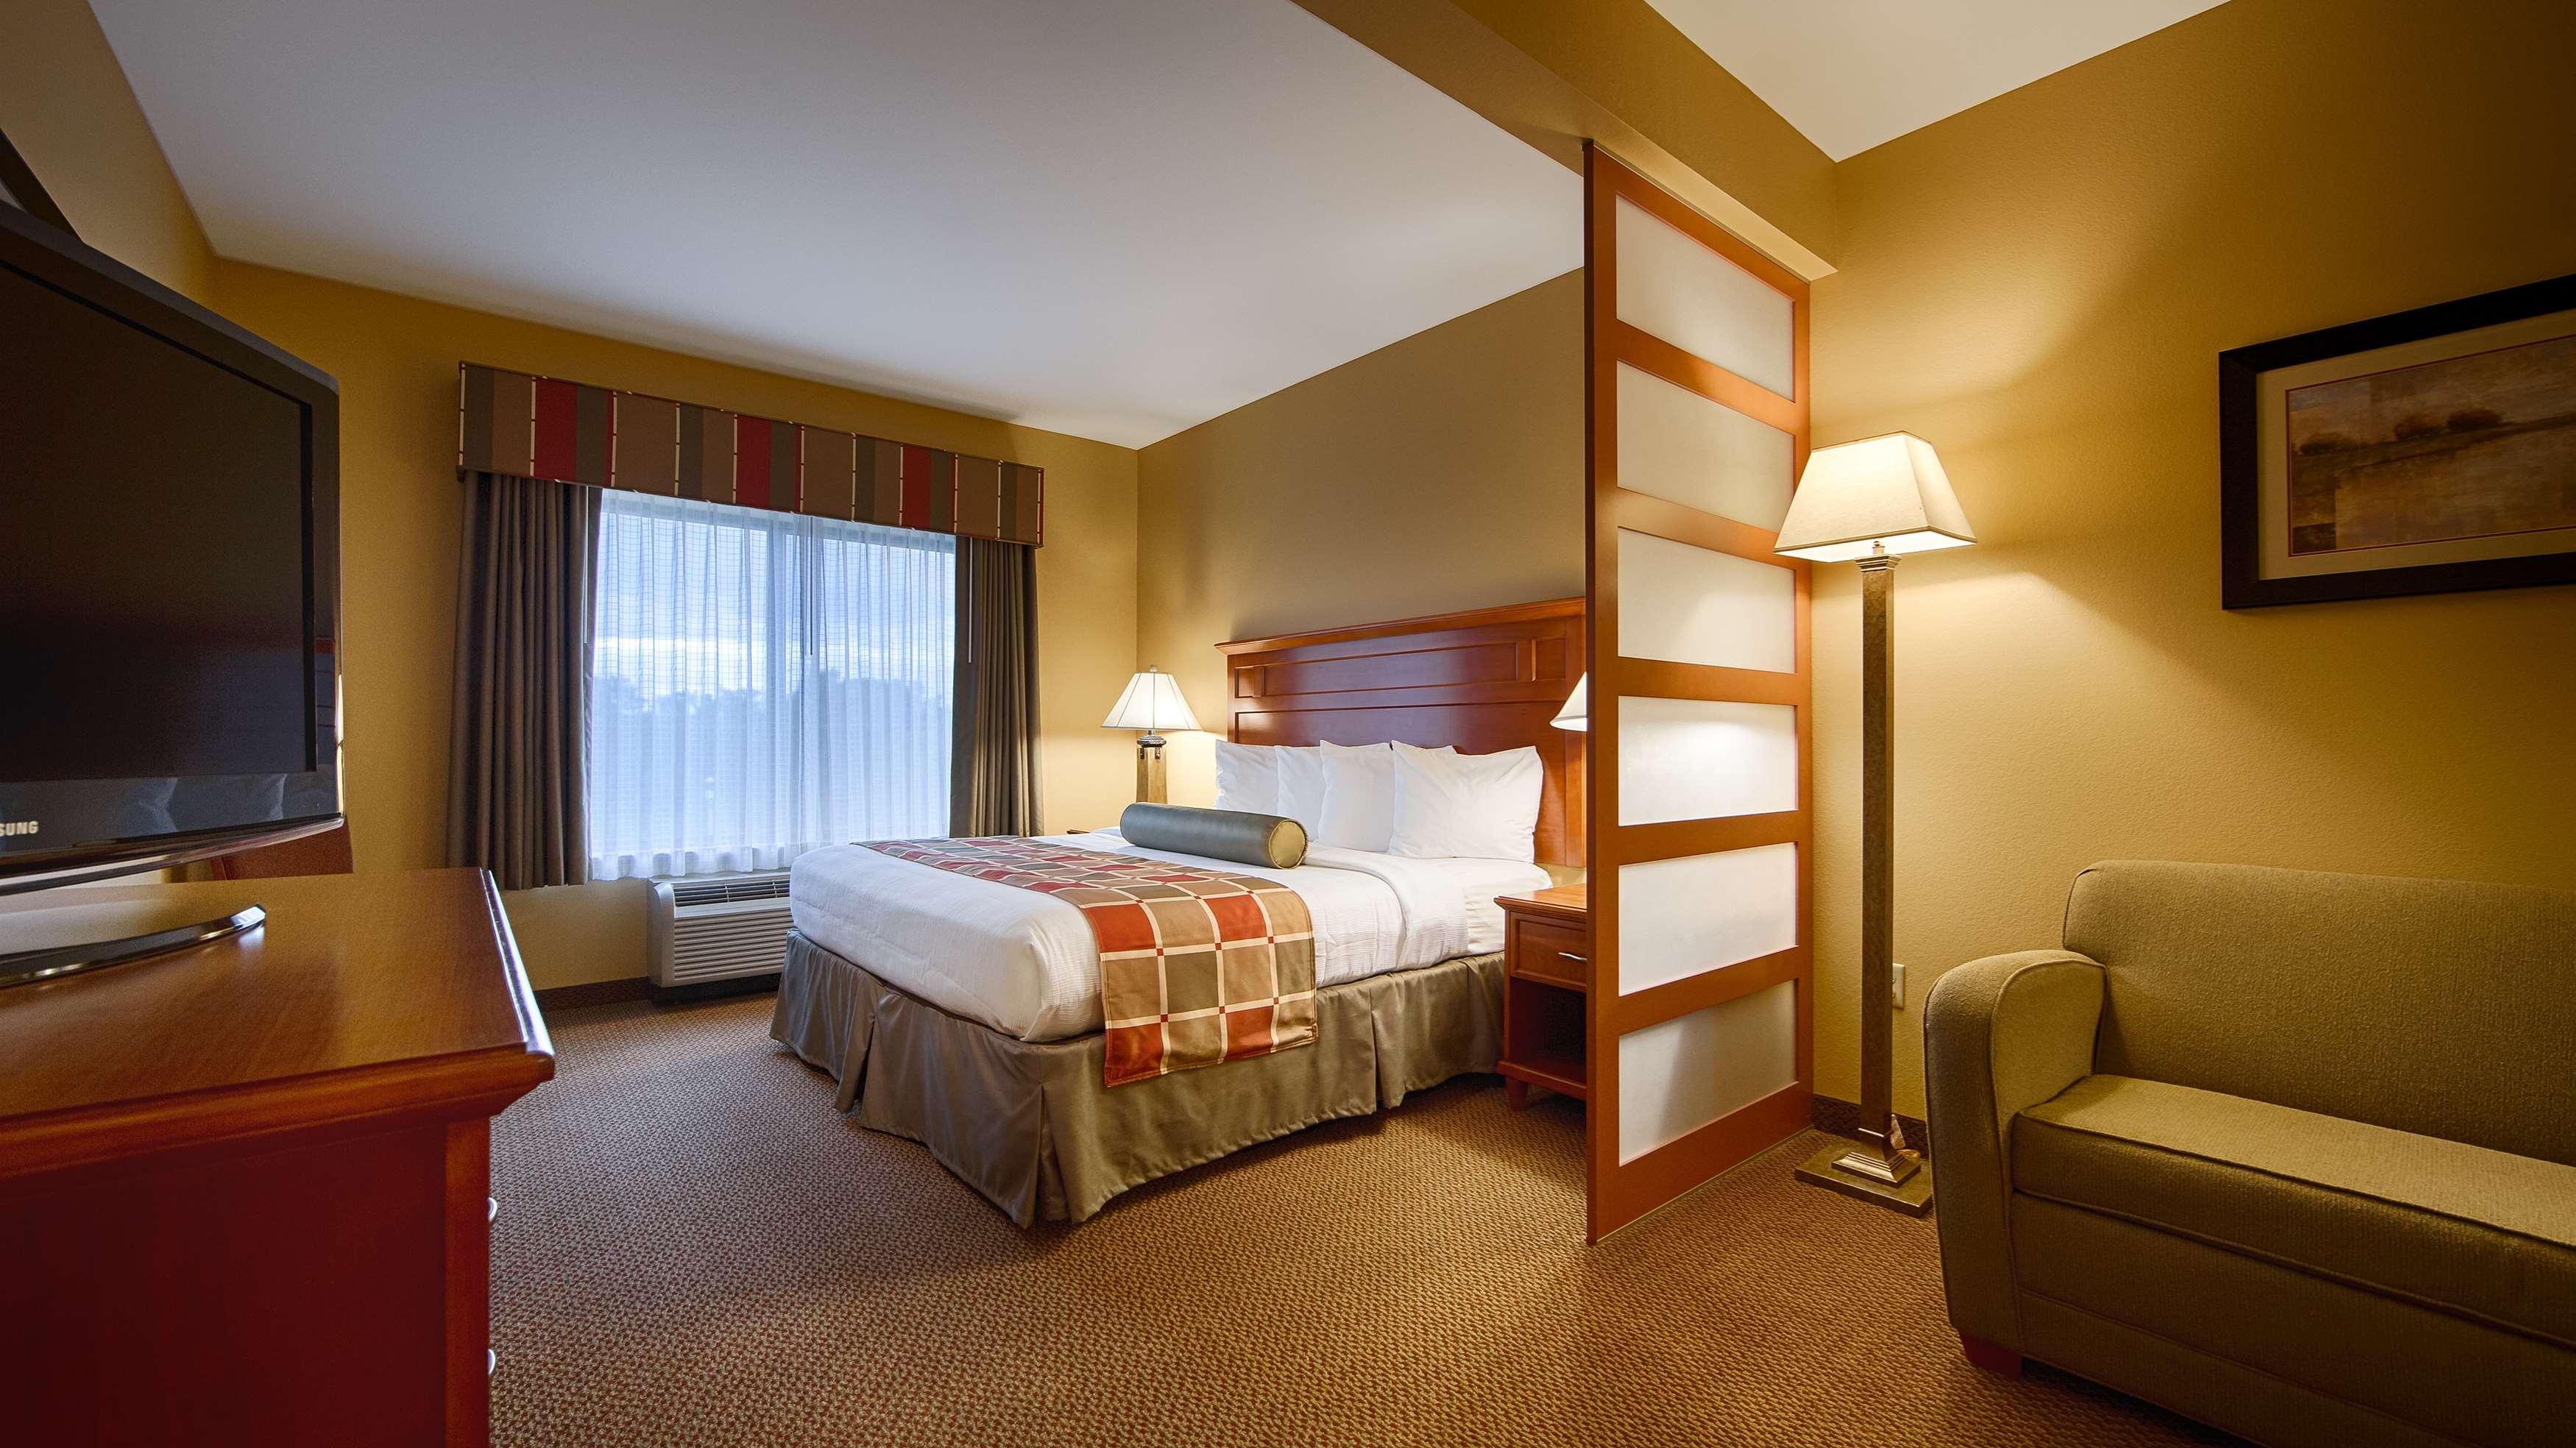 Best Western Plus University Park Inn & Suites image 18